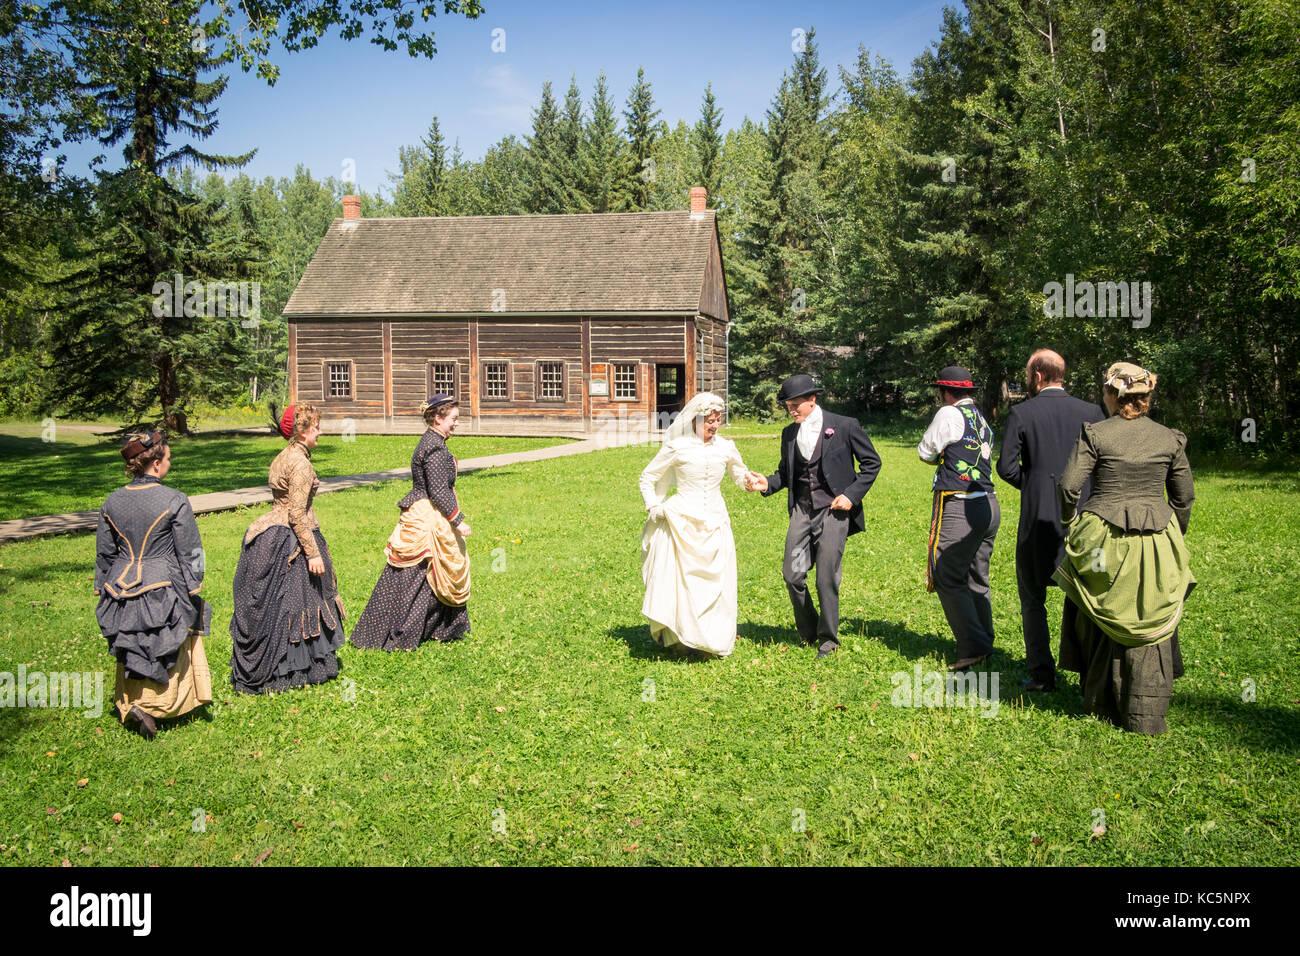 Period actors re-enact a traditional 19th century Métis wedding dance at Fort Edmonton Park in Edmonton, Alberta, - Stock Image